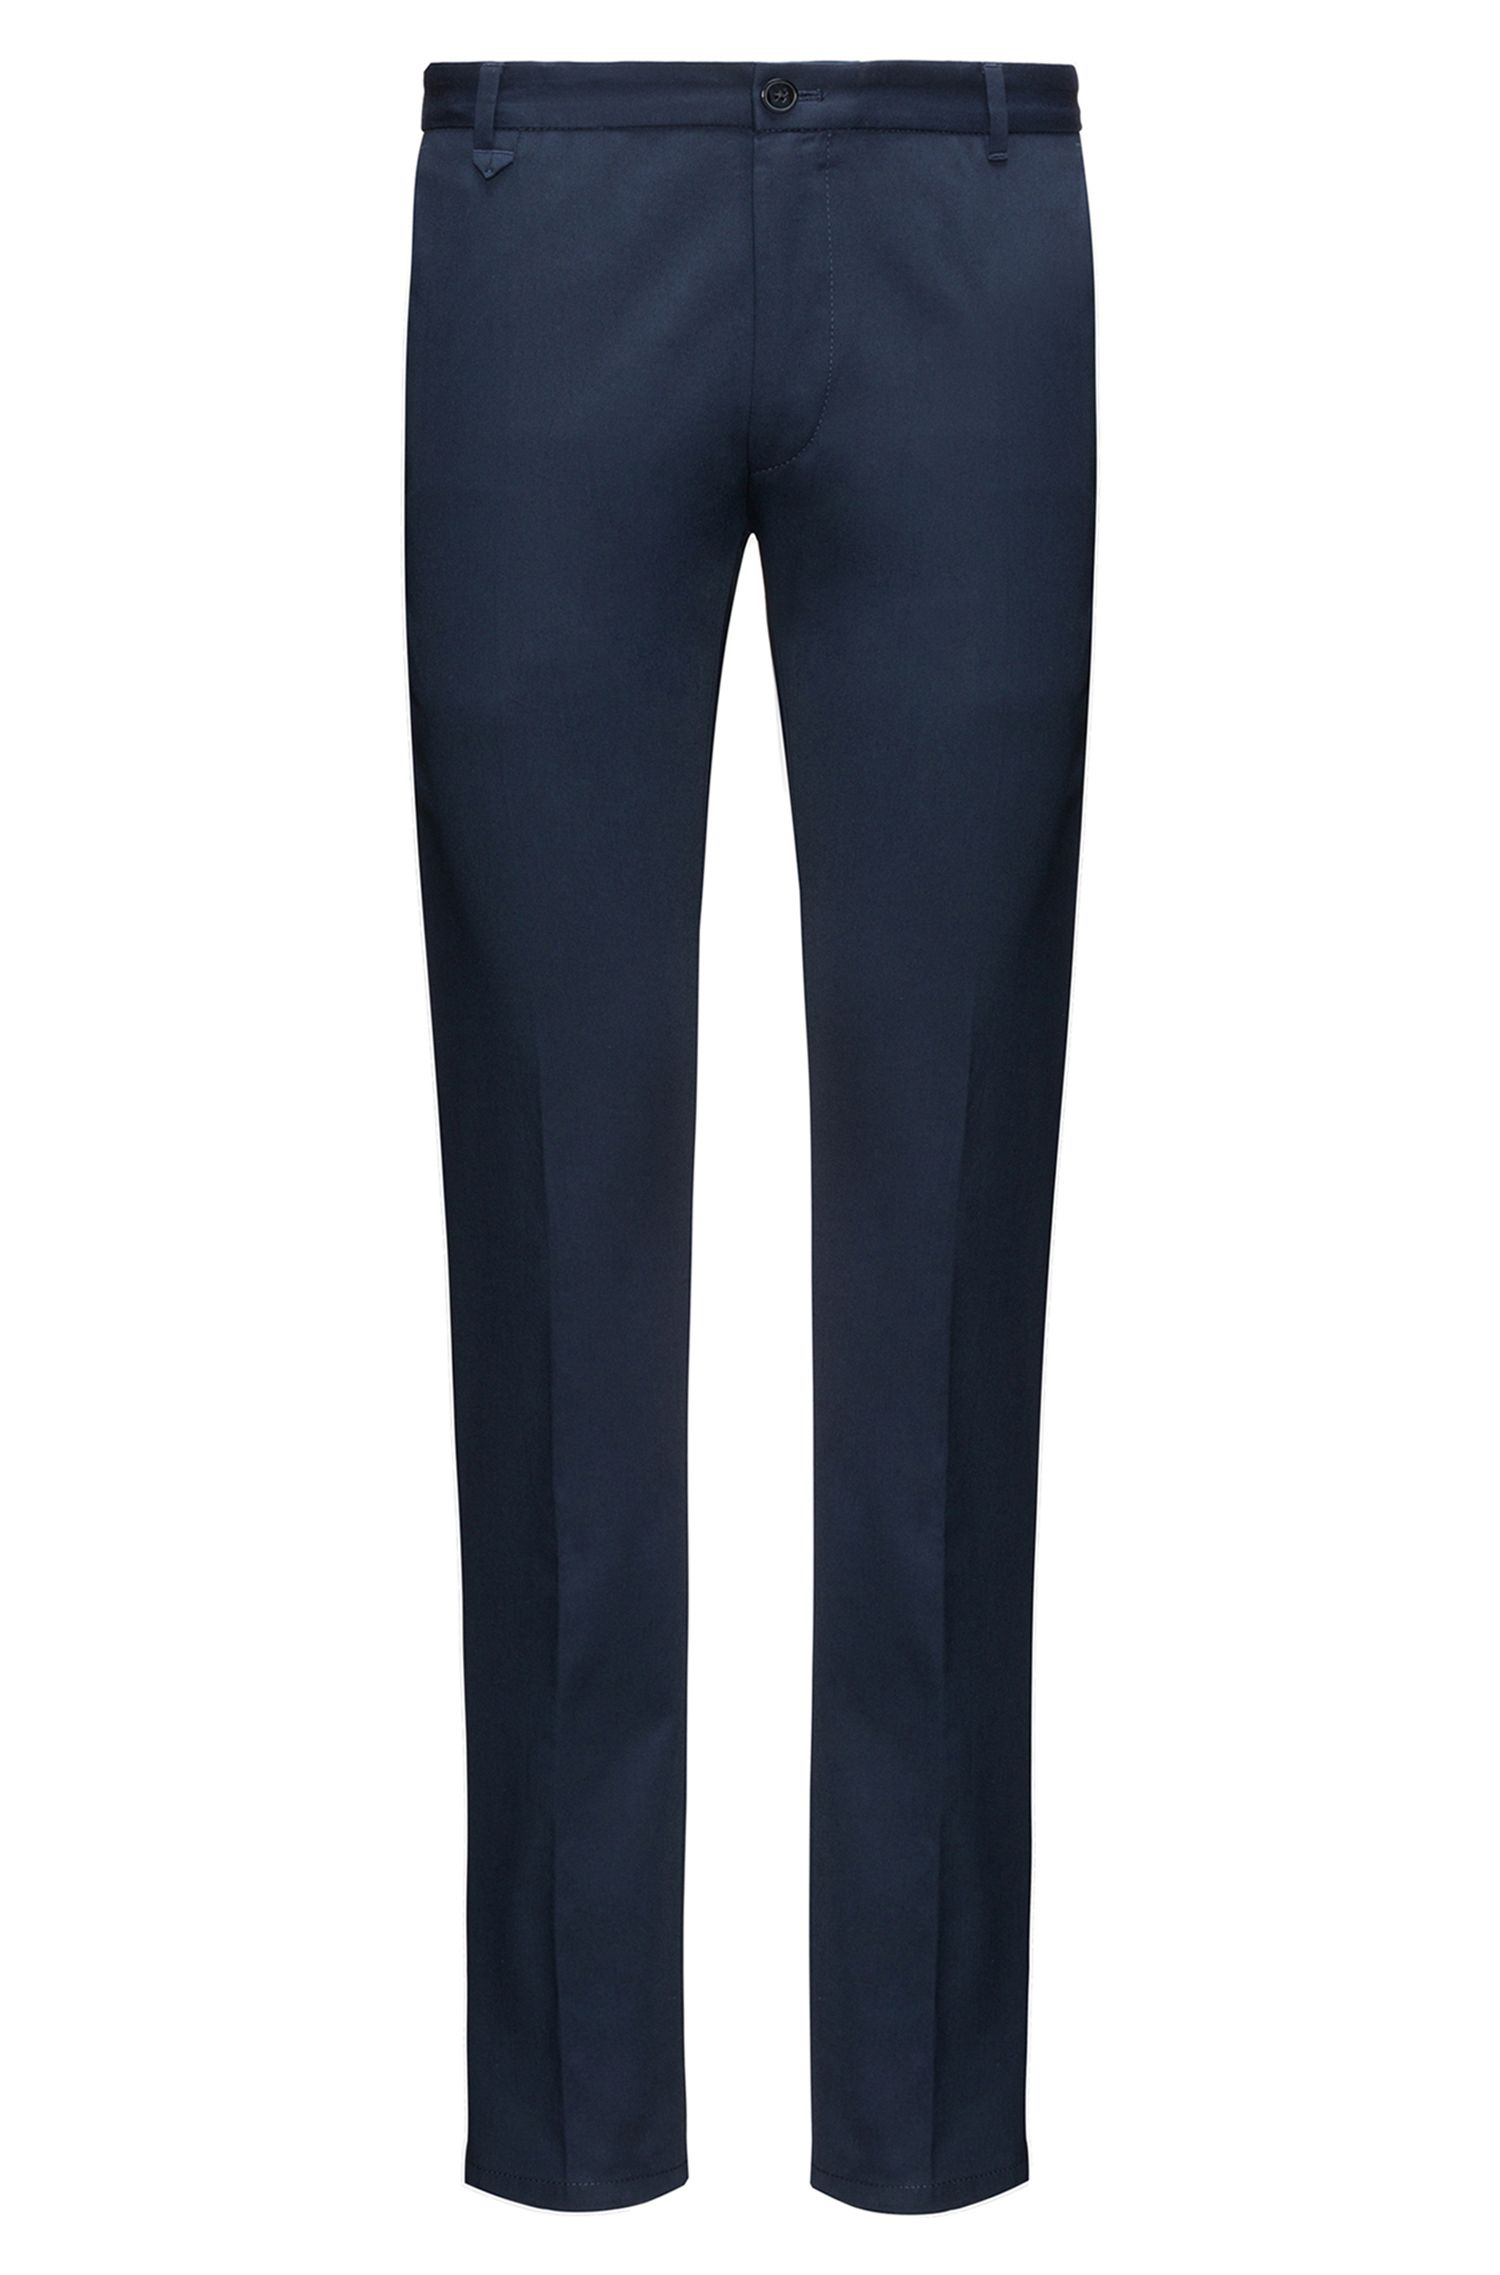 Pantalon Extra Slim Fit en coton stretch